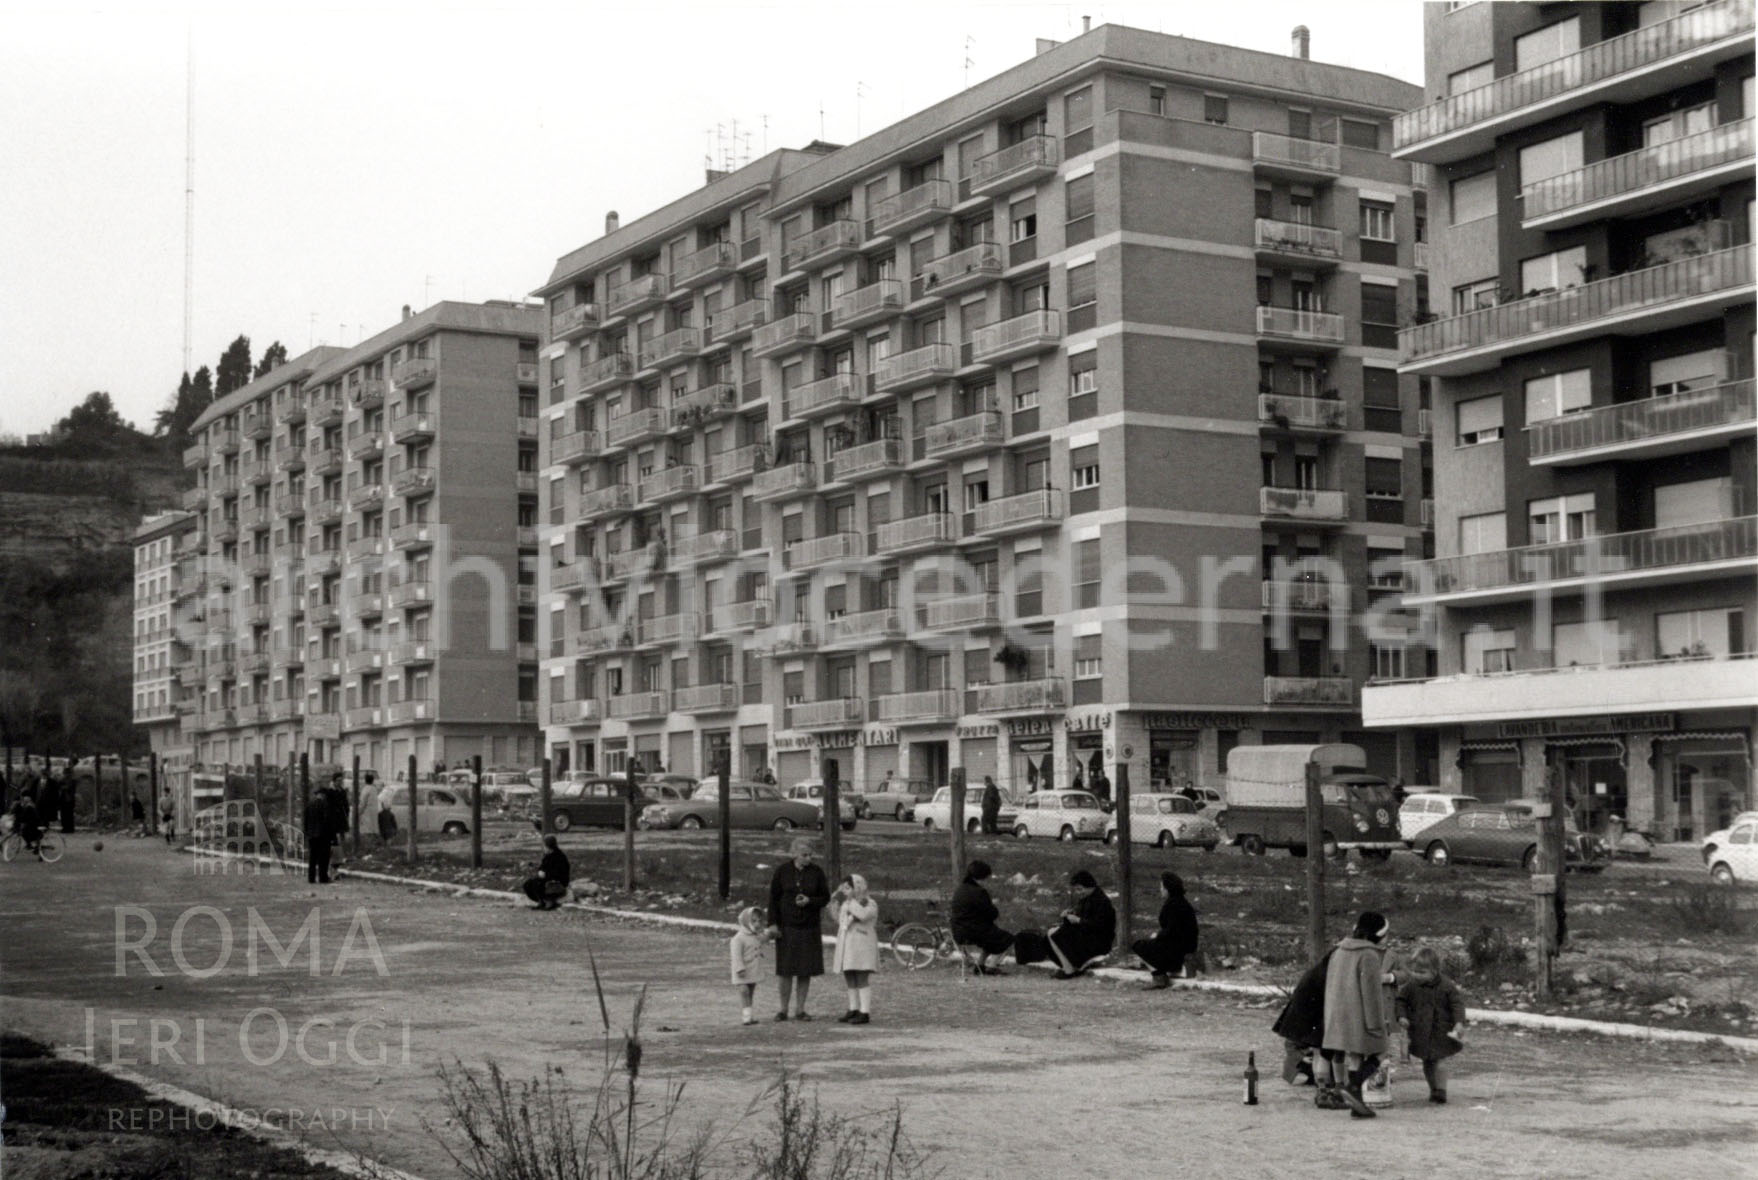 Trionfale (cederna, 1965) 6 foto - viale ammiragli +